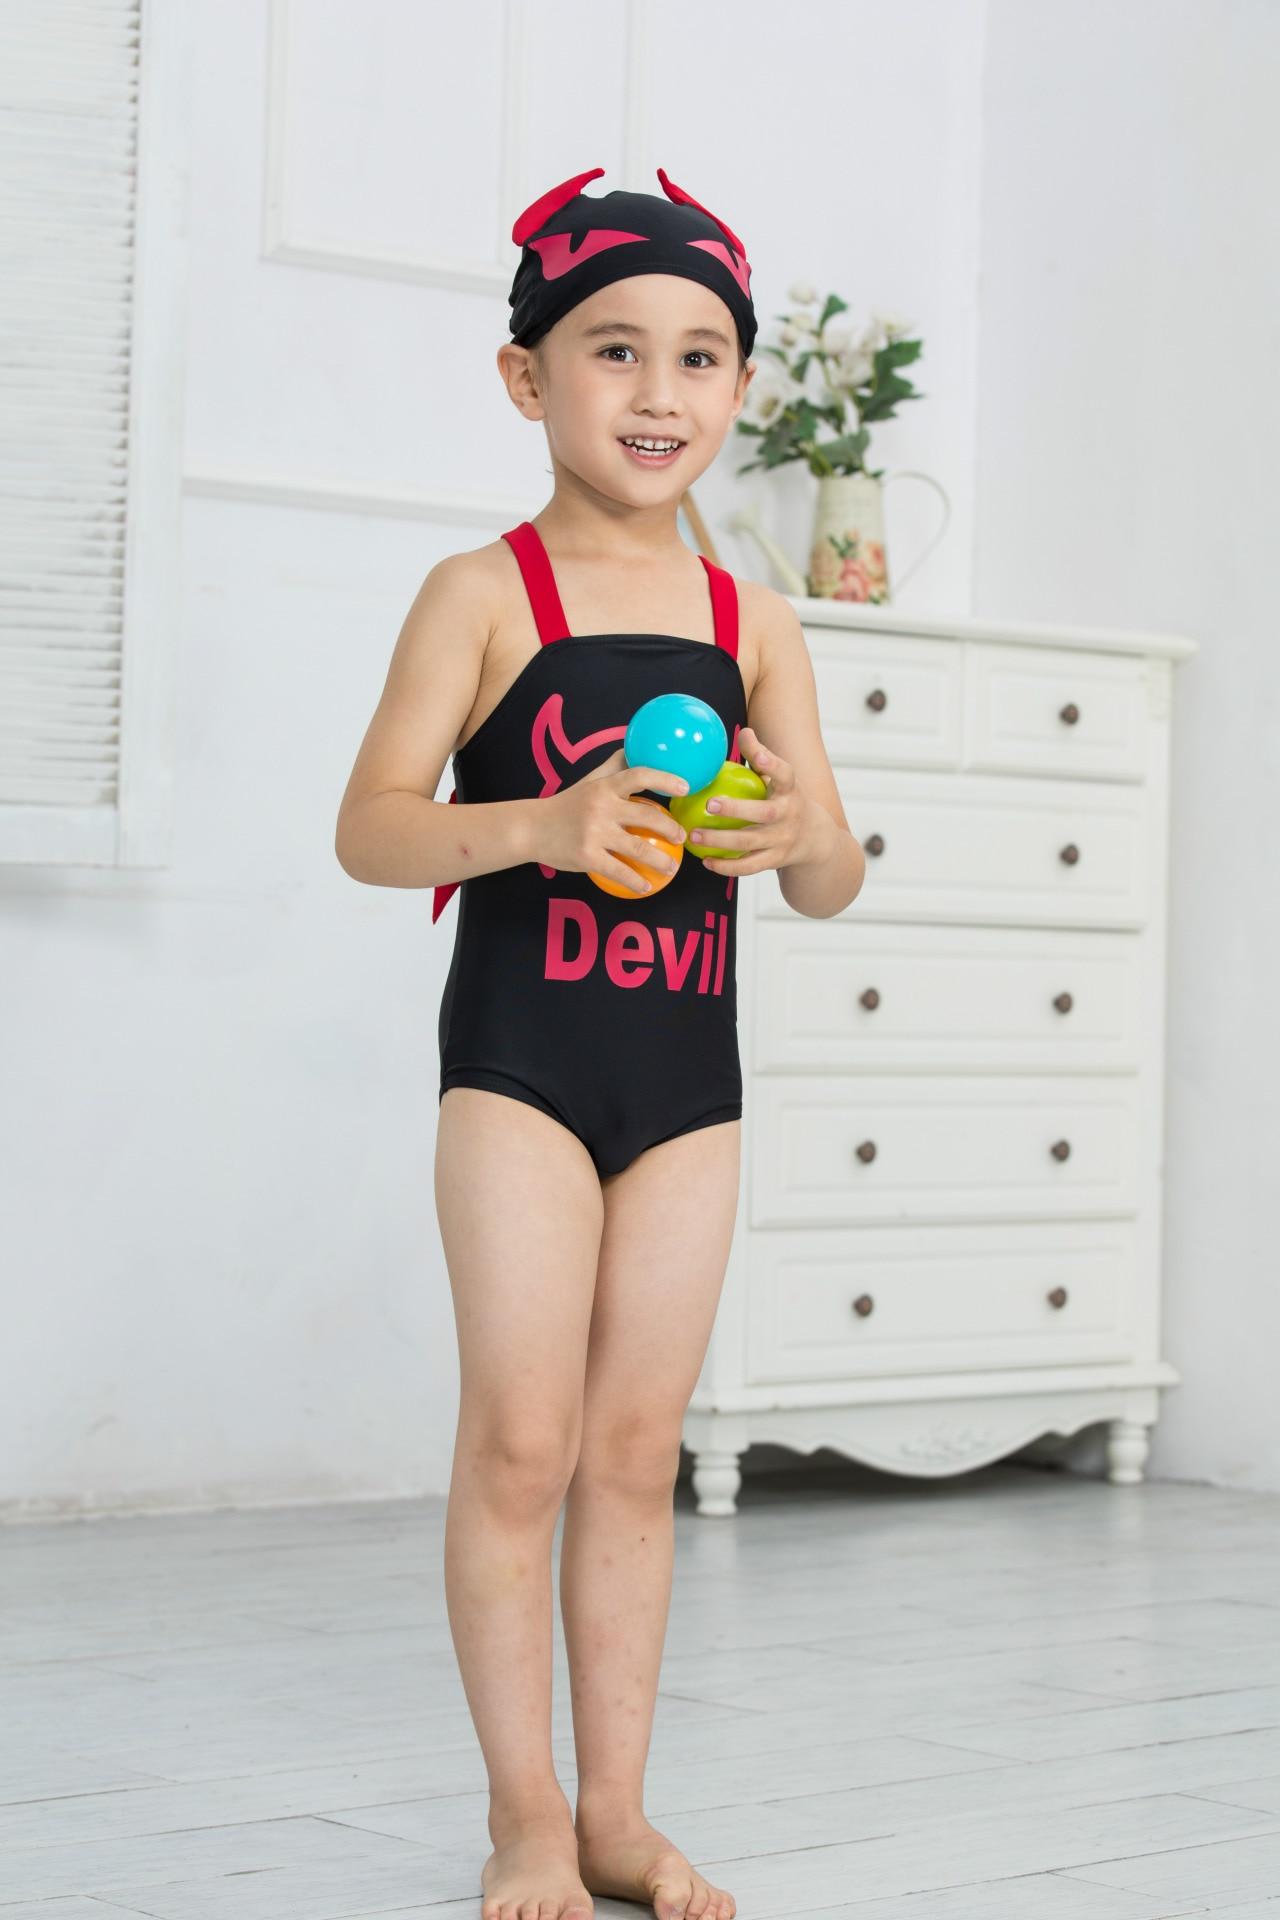 KID'S Swimwear New Style Demon Boys' Cotton One-piece Swimsuit Modeling Swimwear KID'S Swimwear + Swim Cap